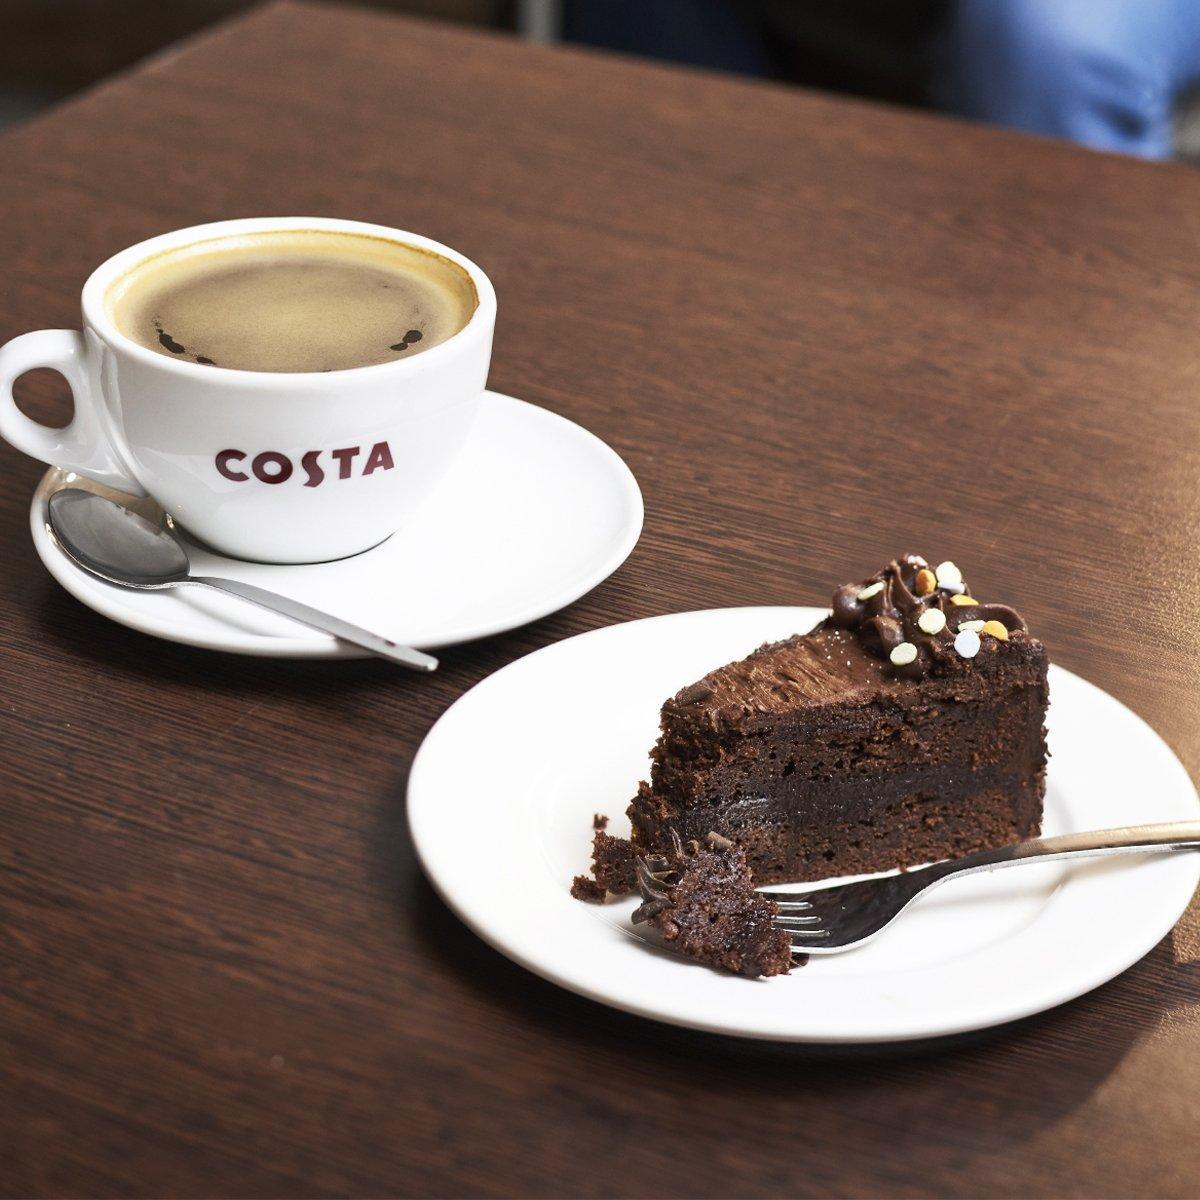 Costa Coffee Cakes